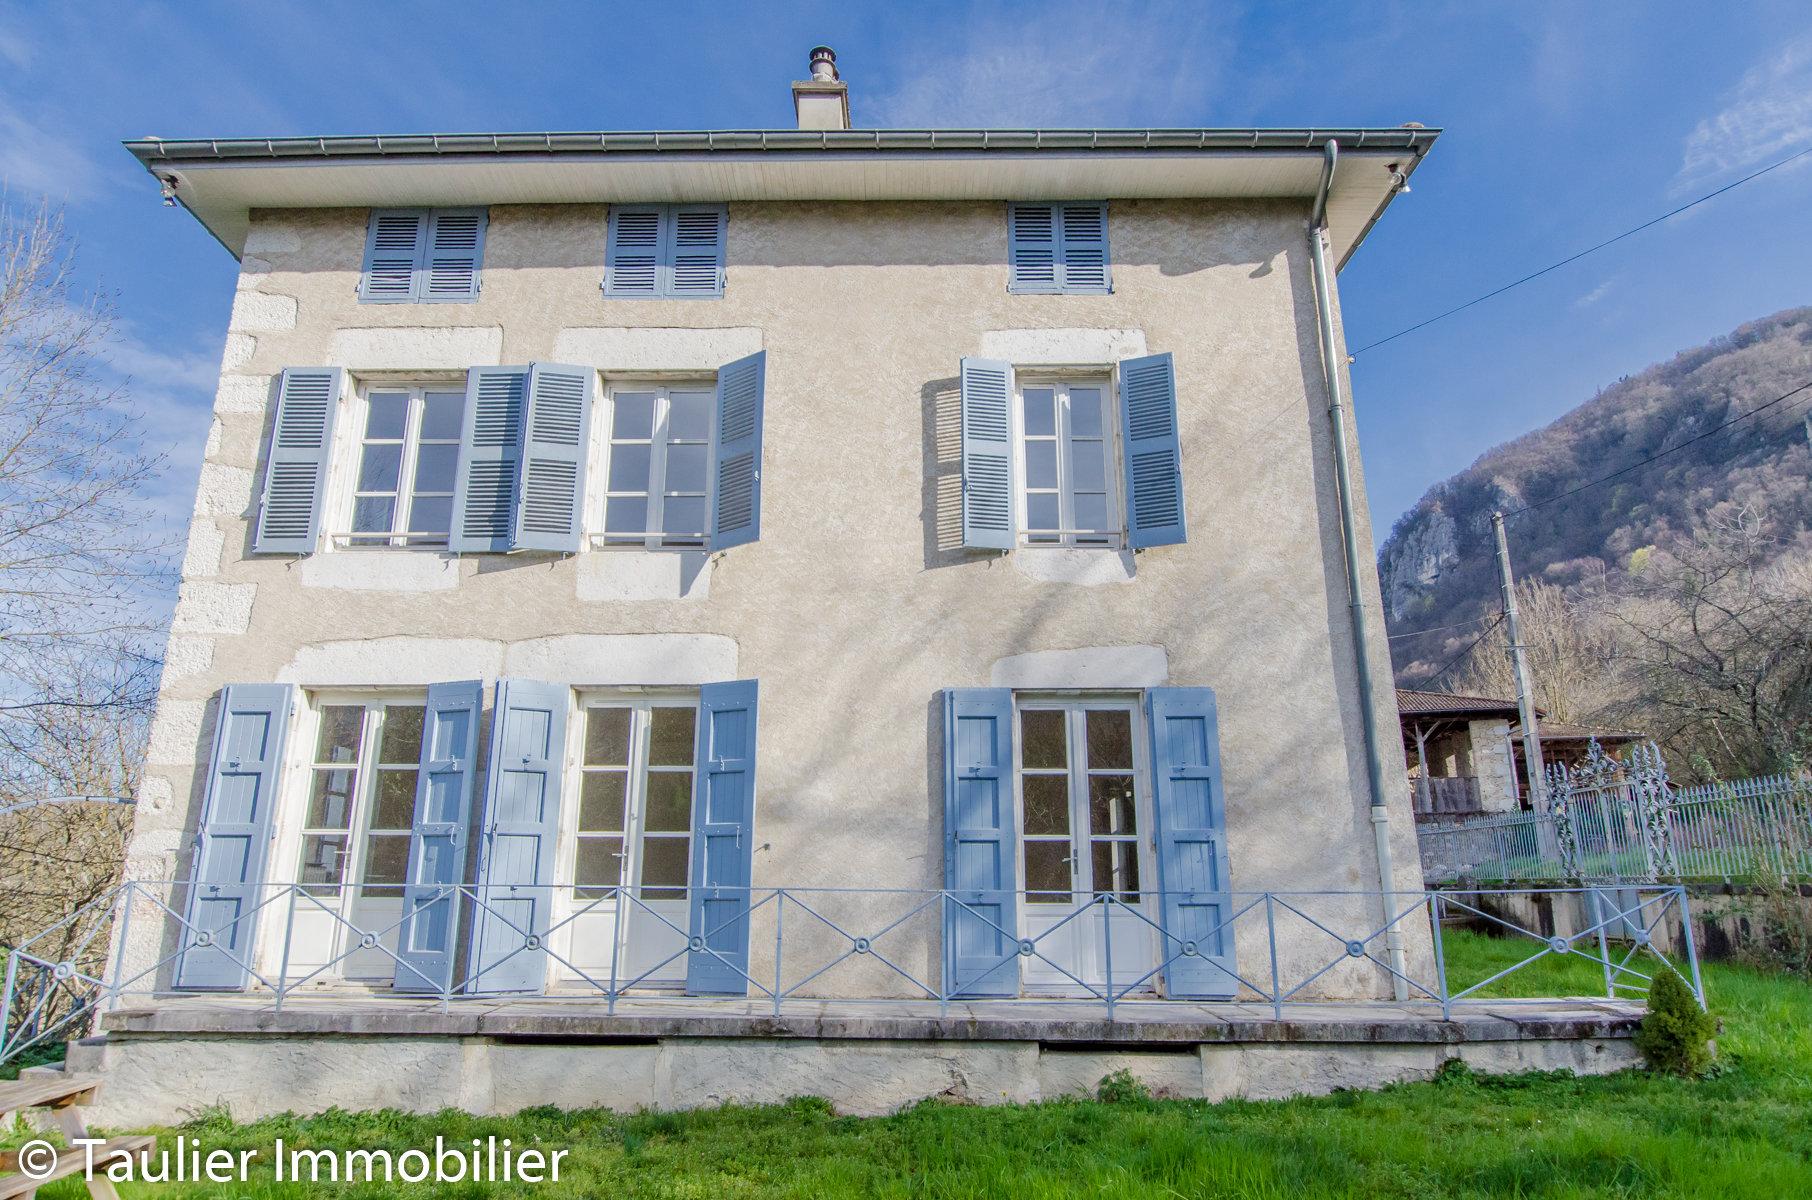 Maison bourgeoise, 5 chambres, grand terrain